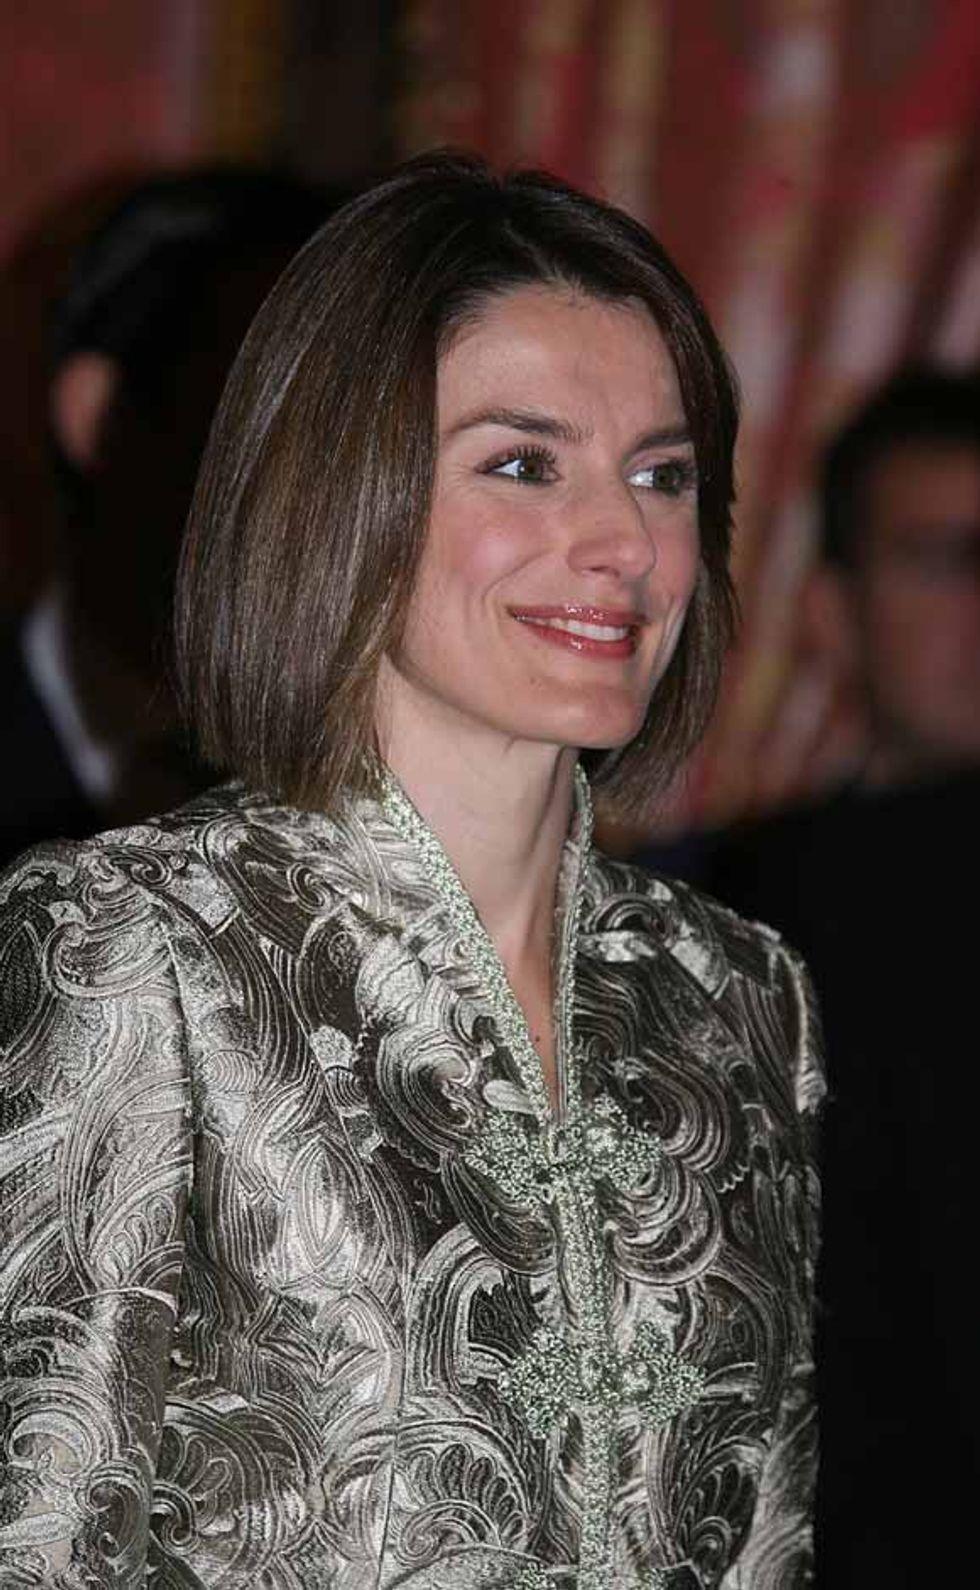 New Look for the Princess of Asturias